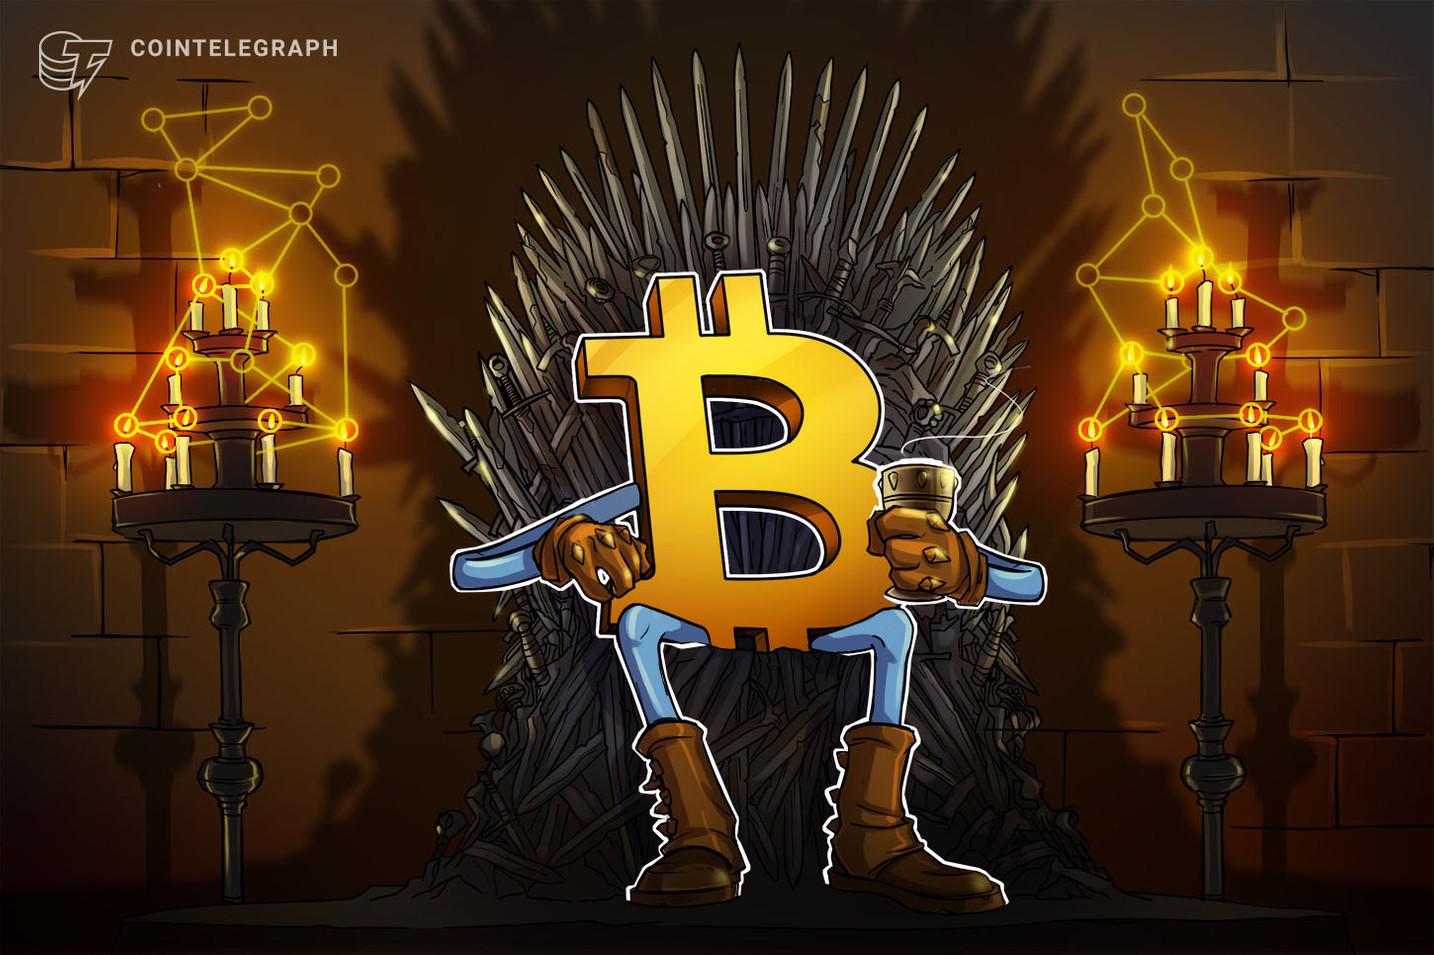 'Bitcoin é o rei das criptomoedas e está aqui para ficar' diz o CEO da eToro